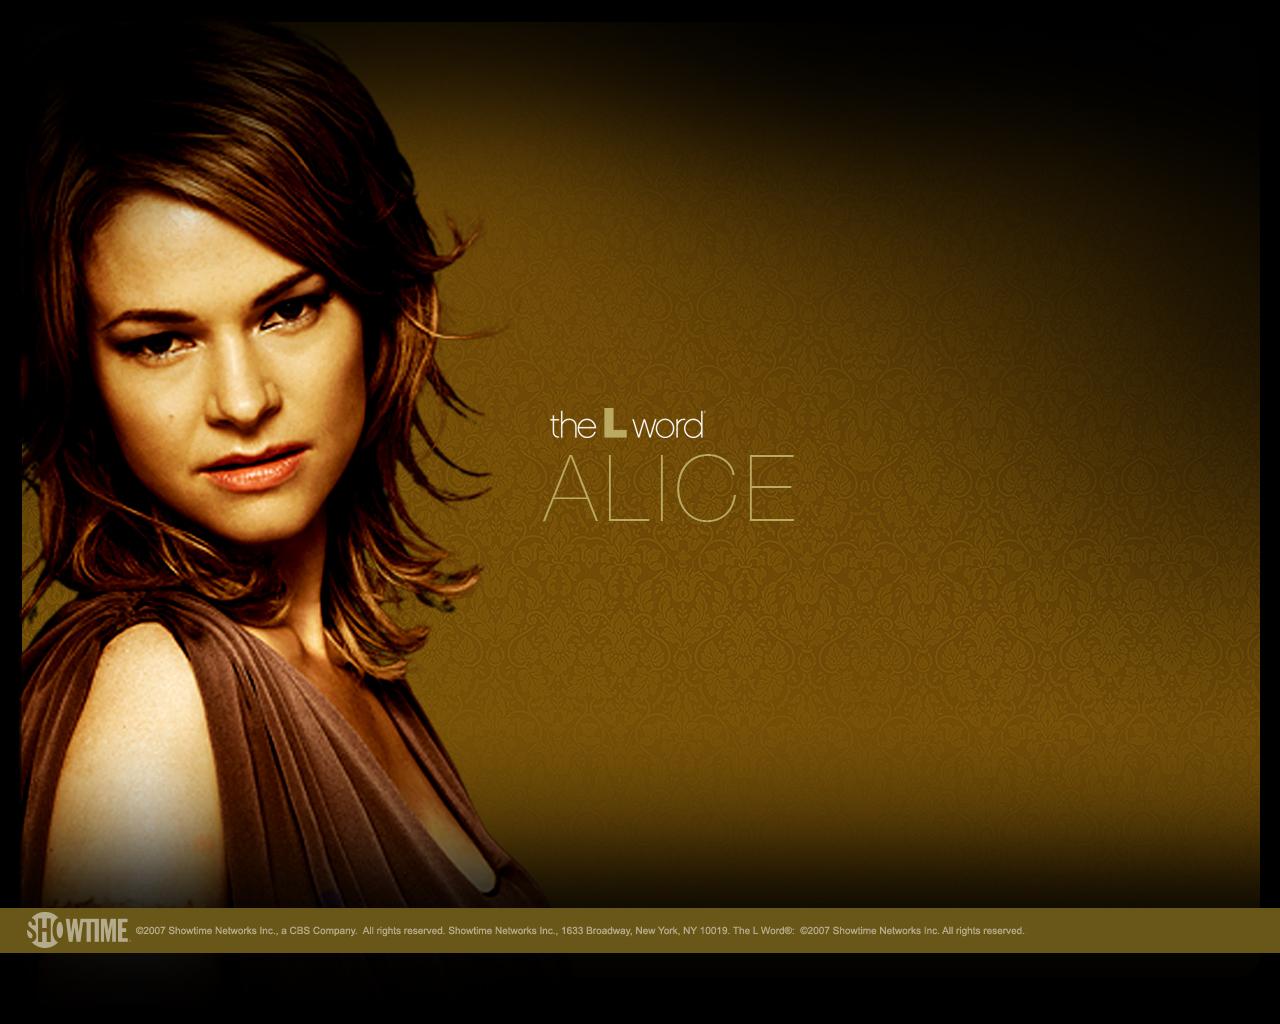 The l word alice